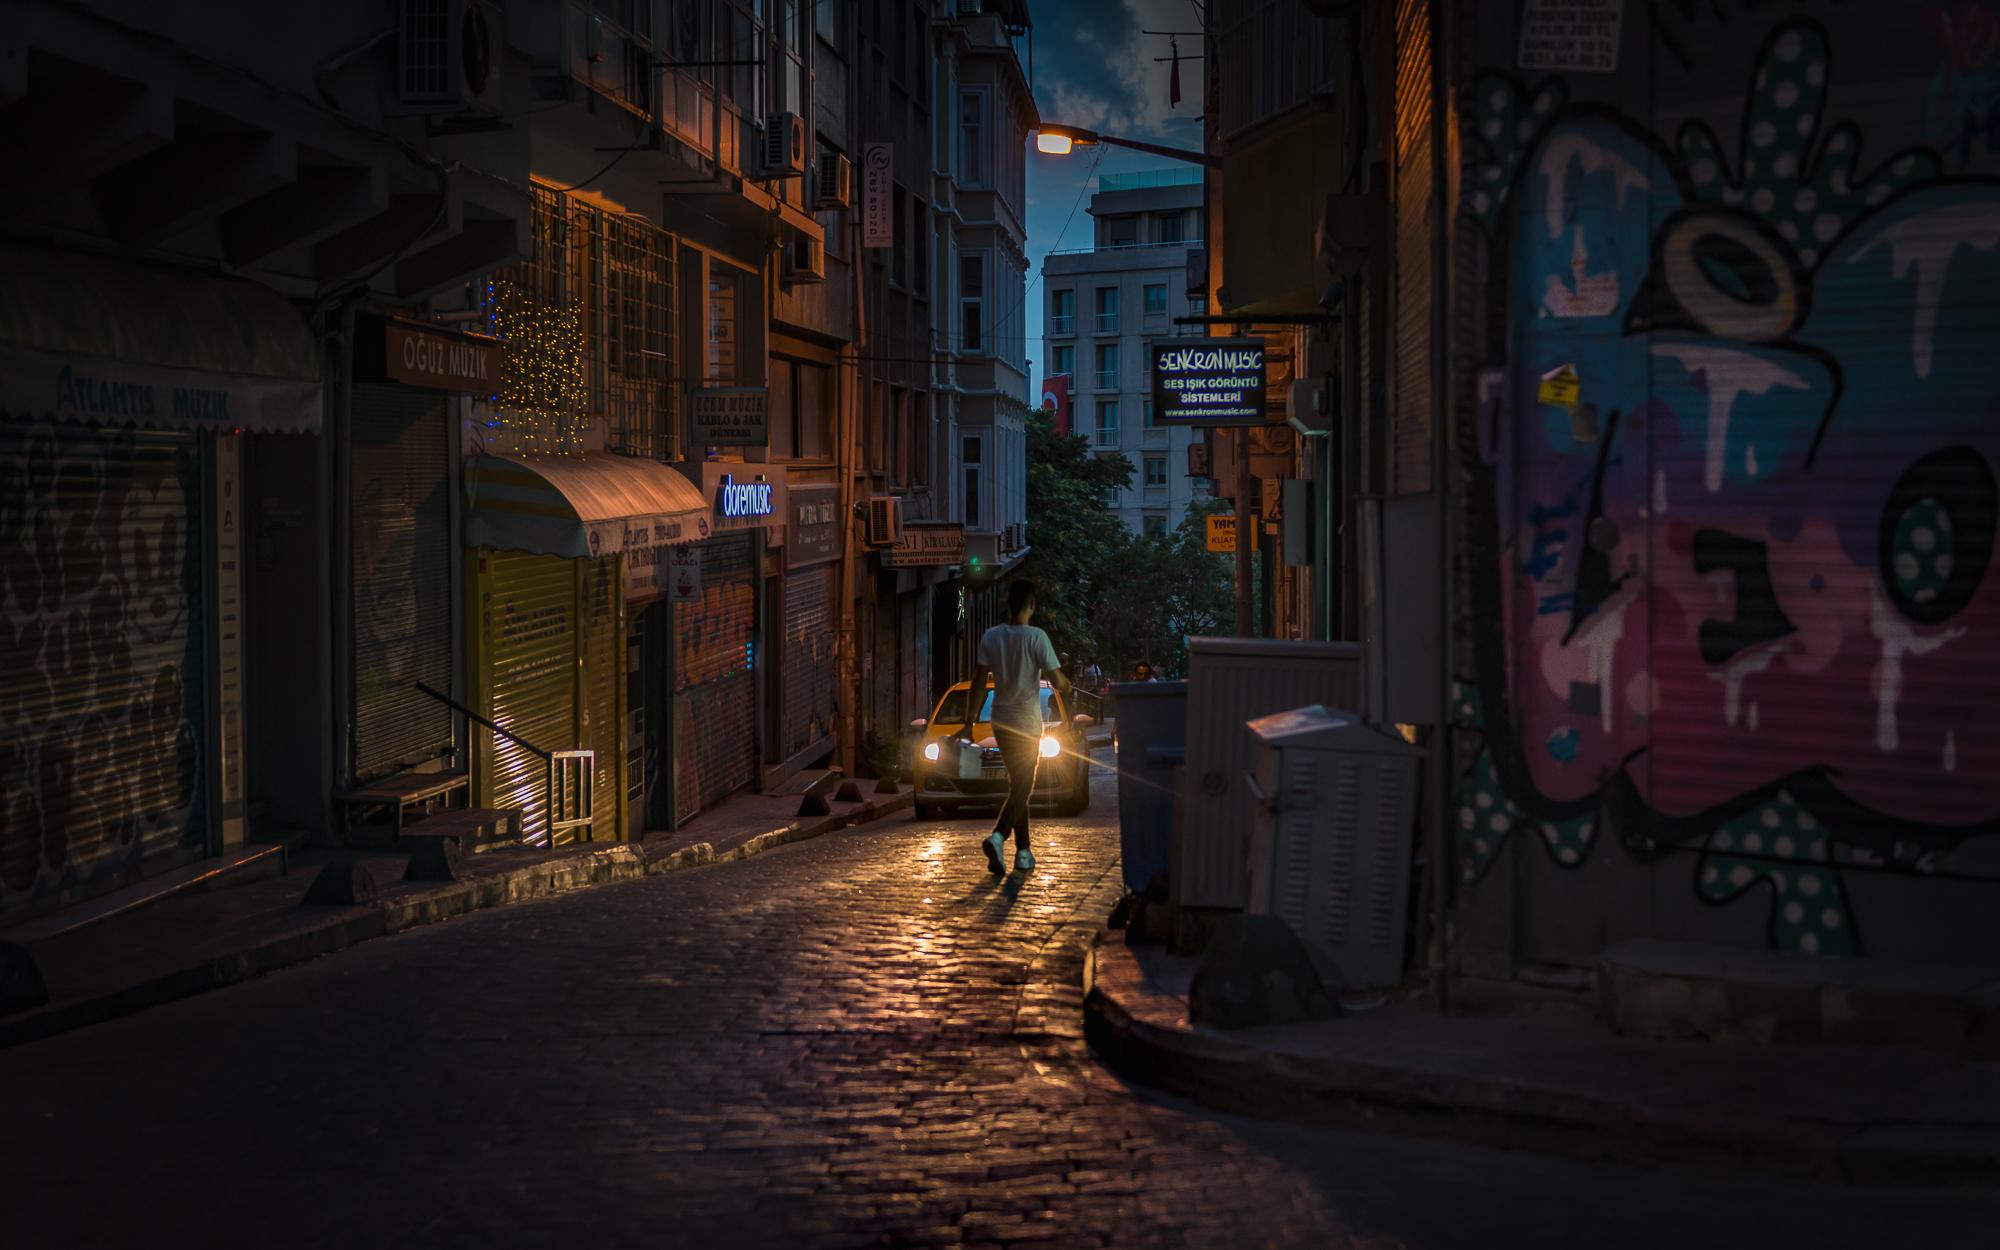 Istanbul 2016-3